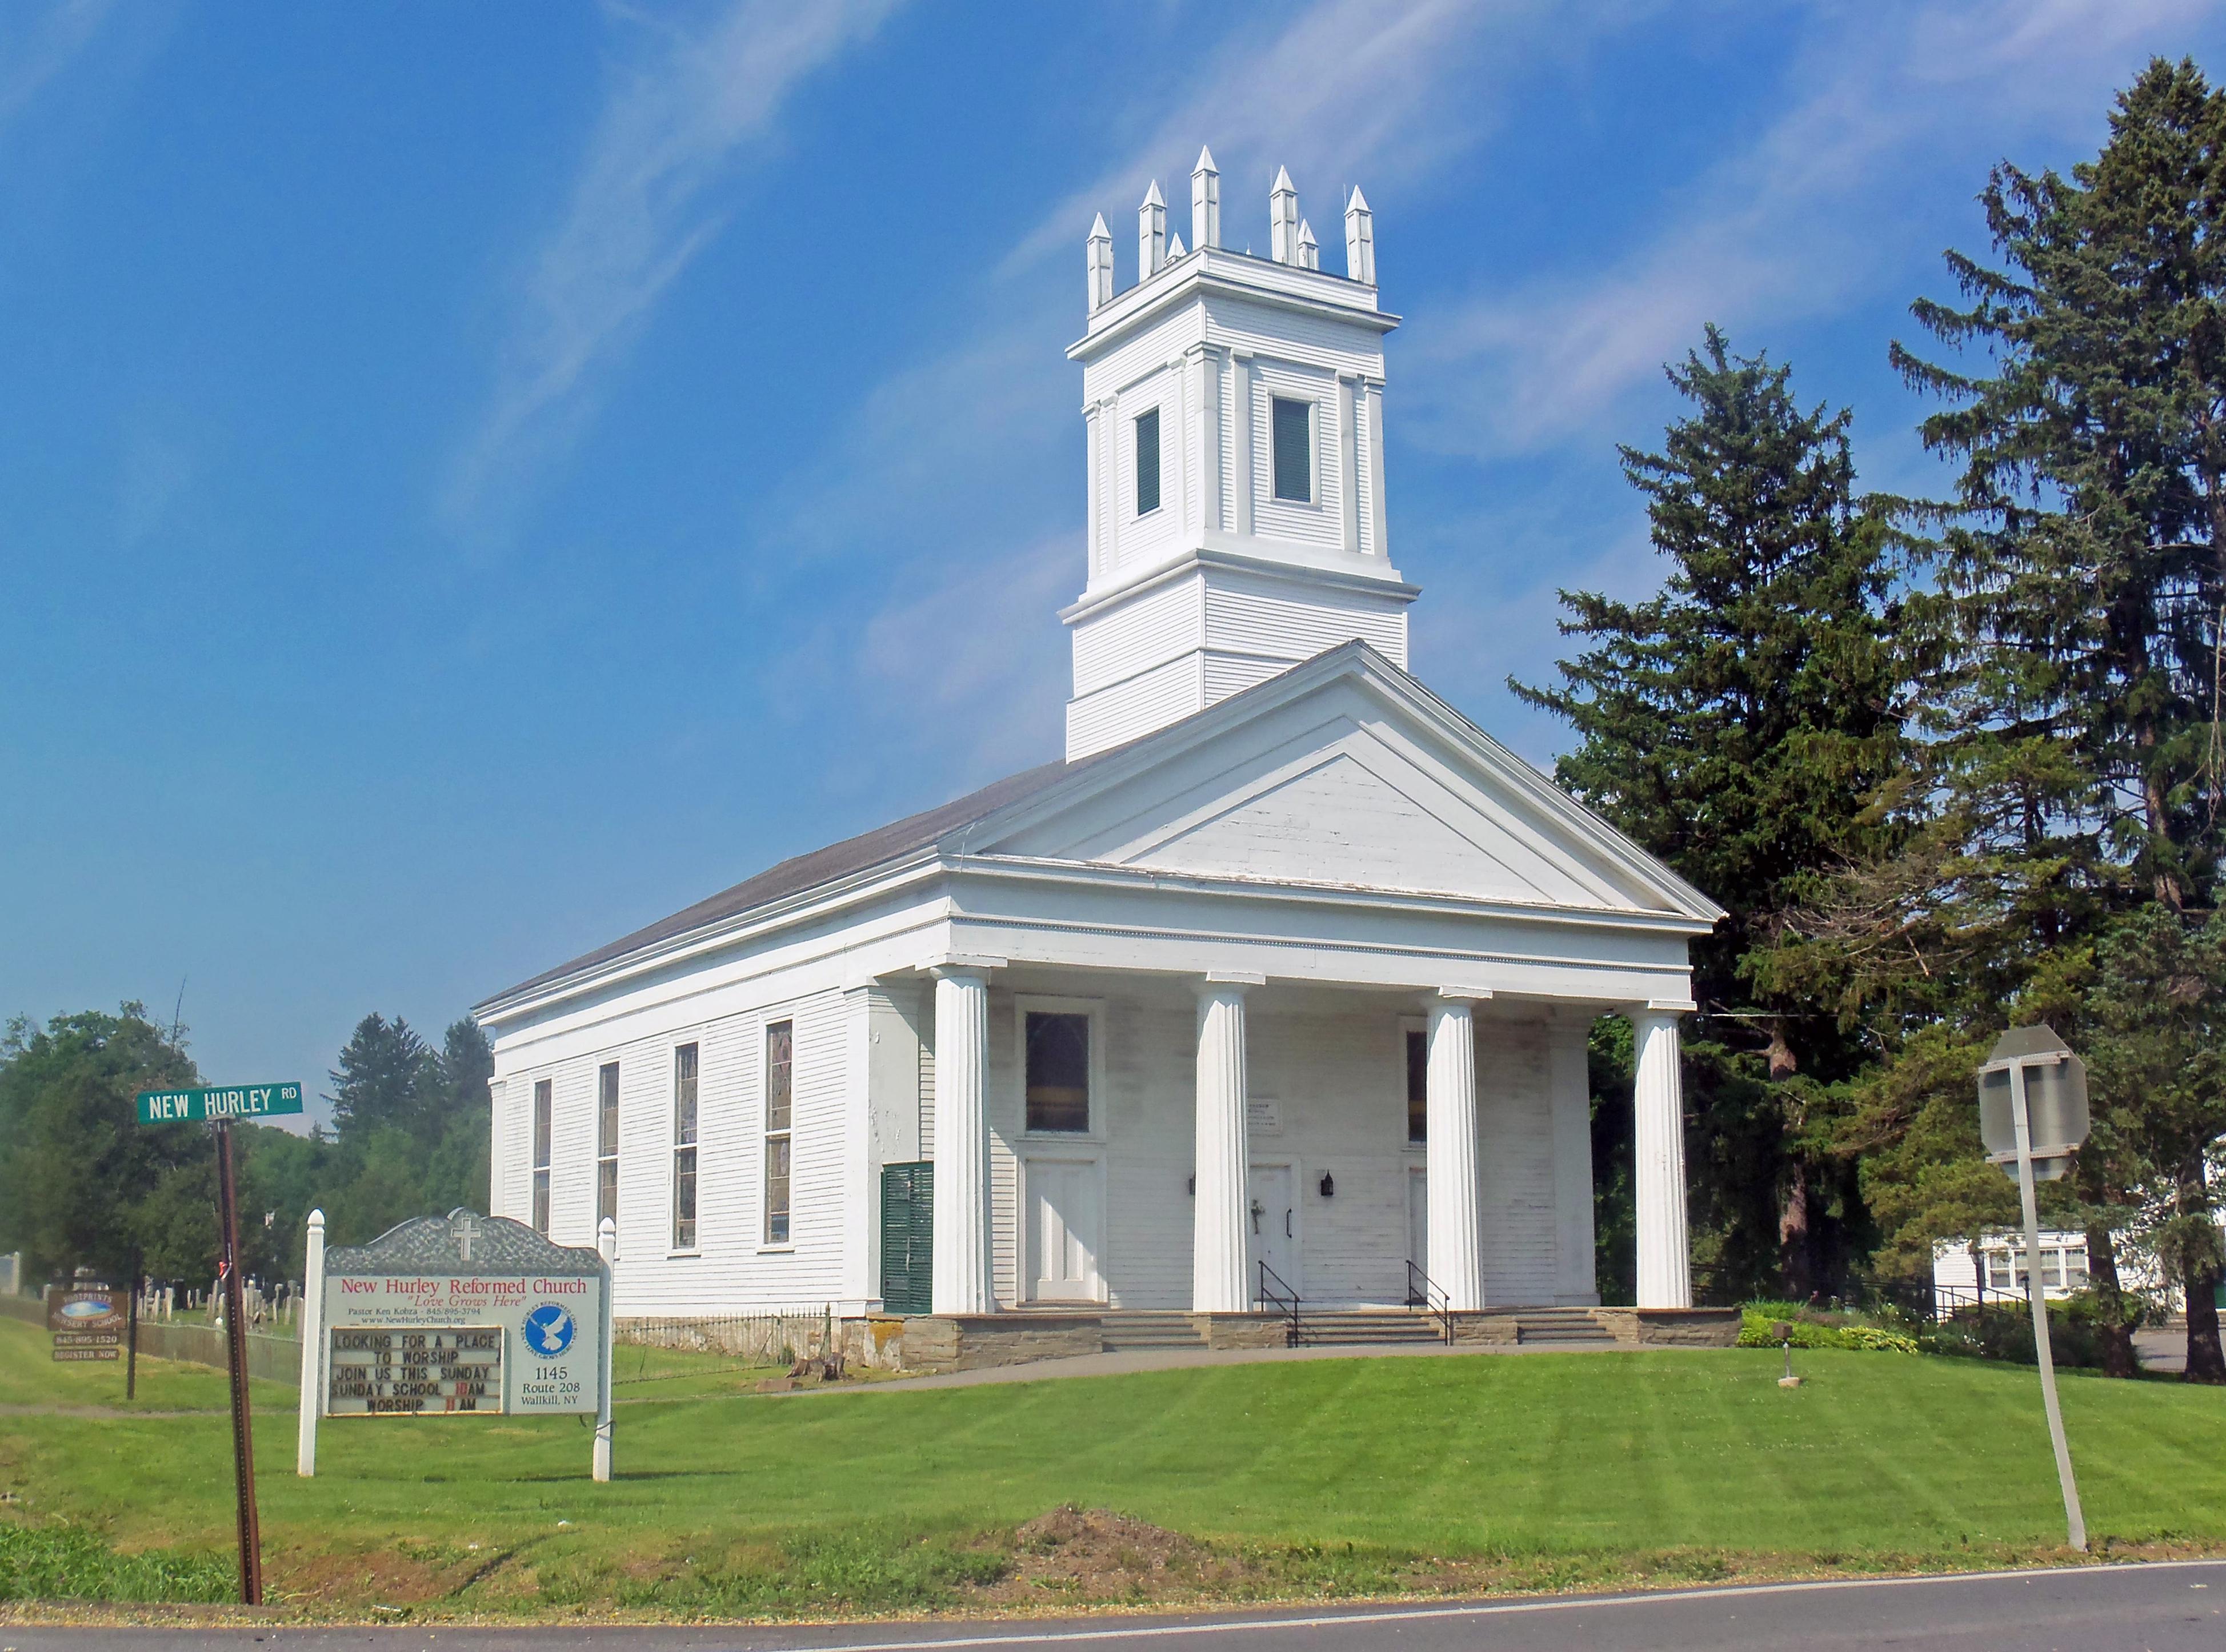 Small Church Organizational Chart: New Hurley Reformed Church - Wikipedia,Chart